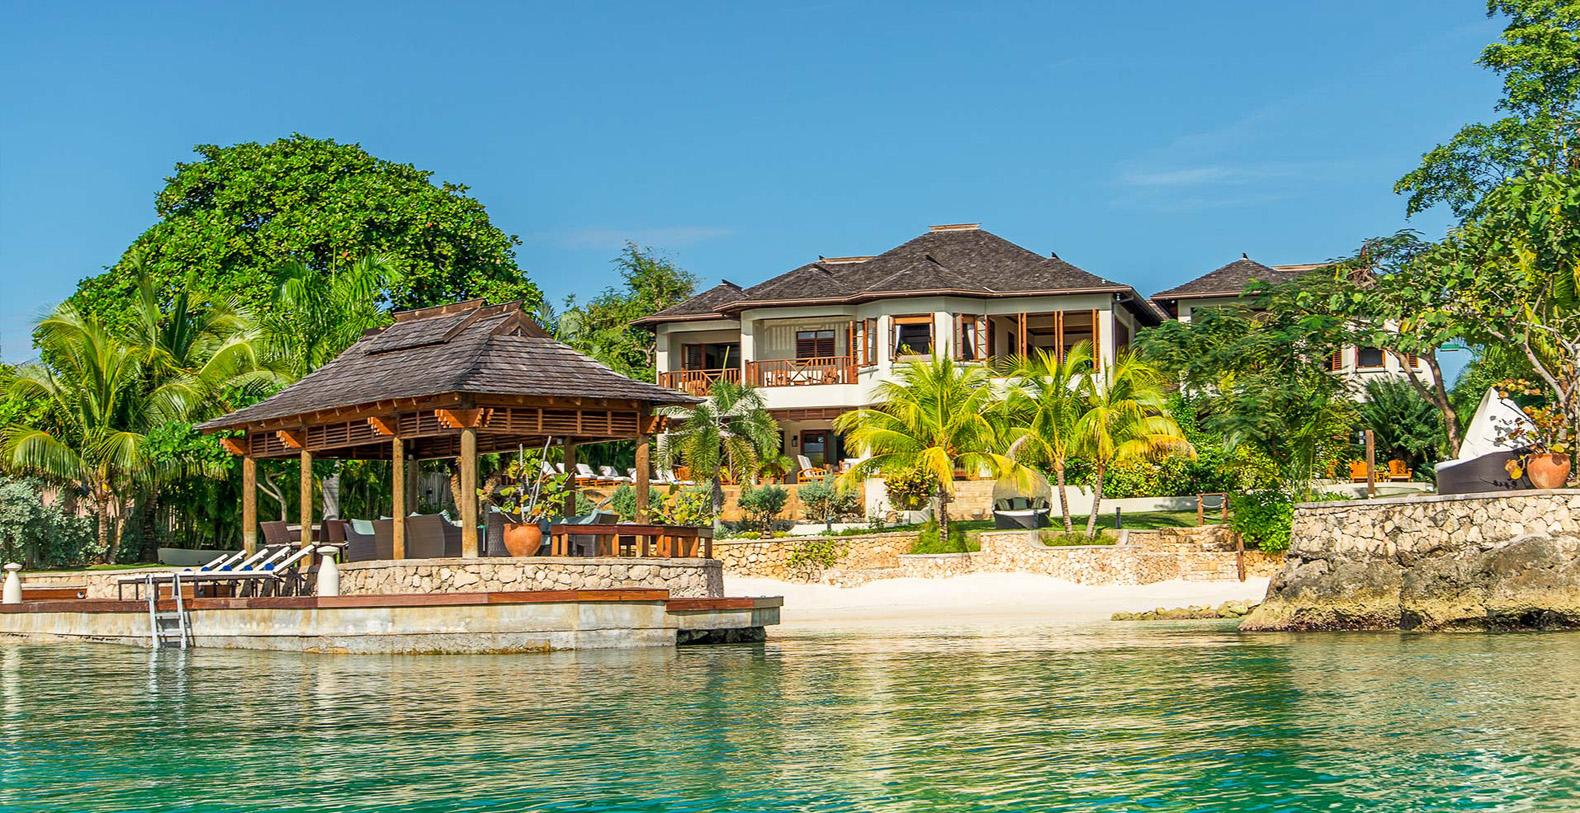 Makana villa jamaica vacation rentals jamaica for Jamaica vacation homes